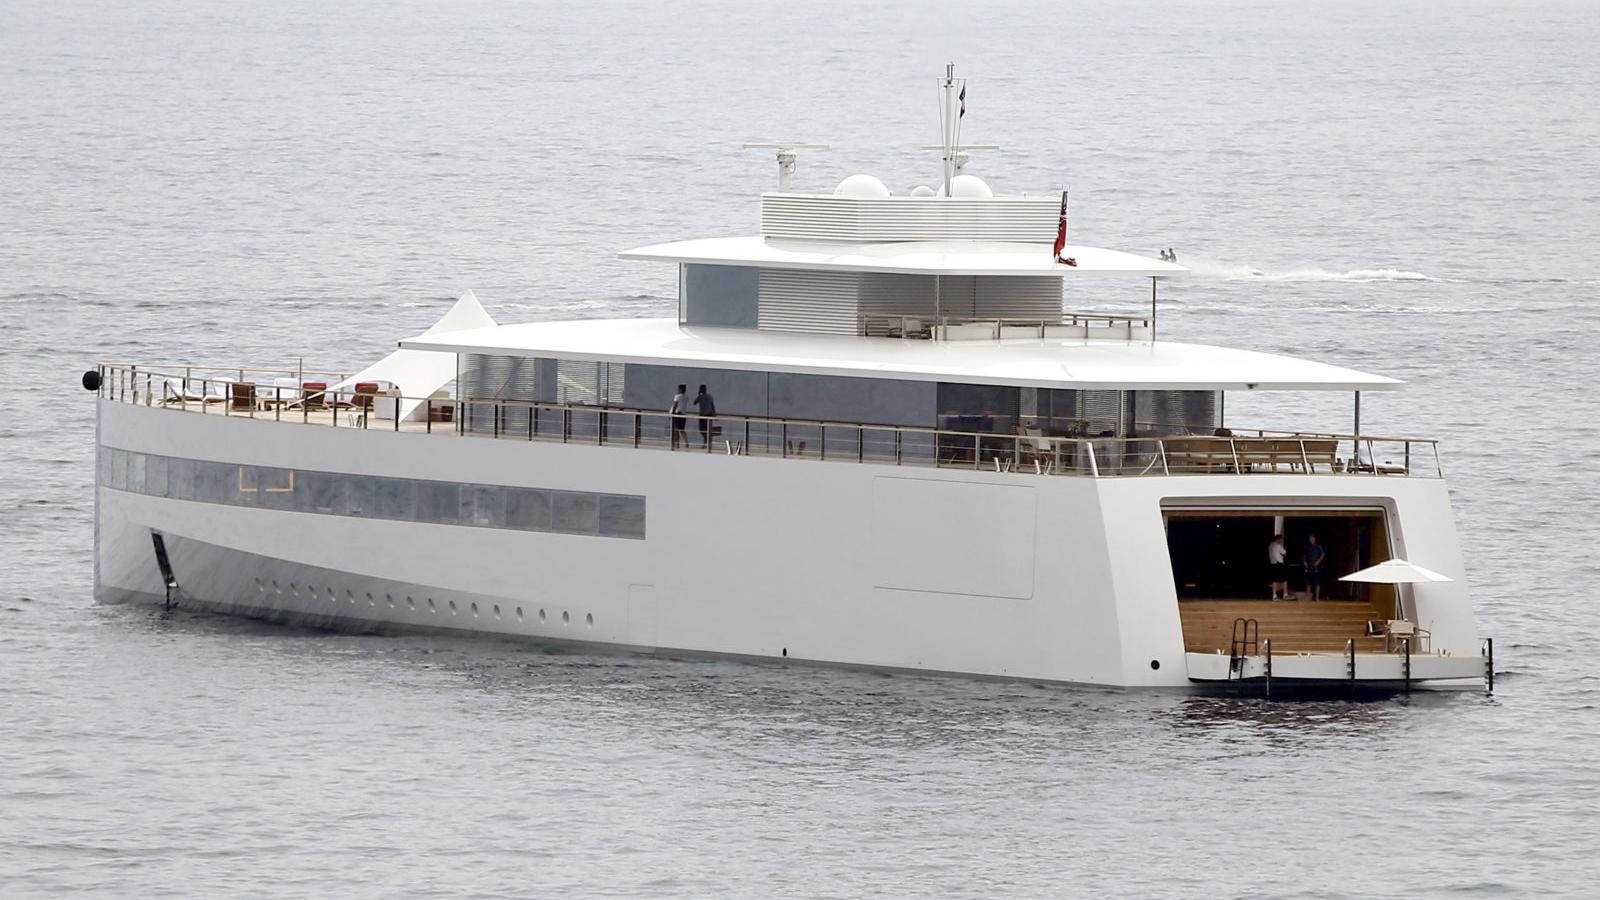 Steve-Jobs-Superyacht-Luxushajo-Philippe-Starck-Tervezo-HAJOZASHU